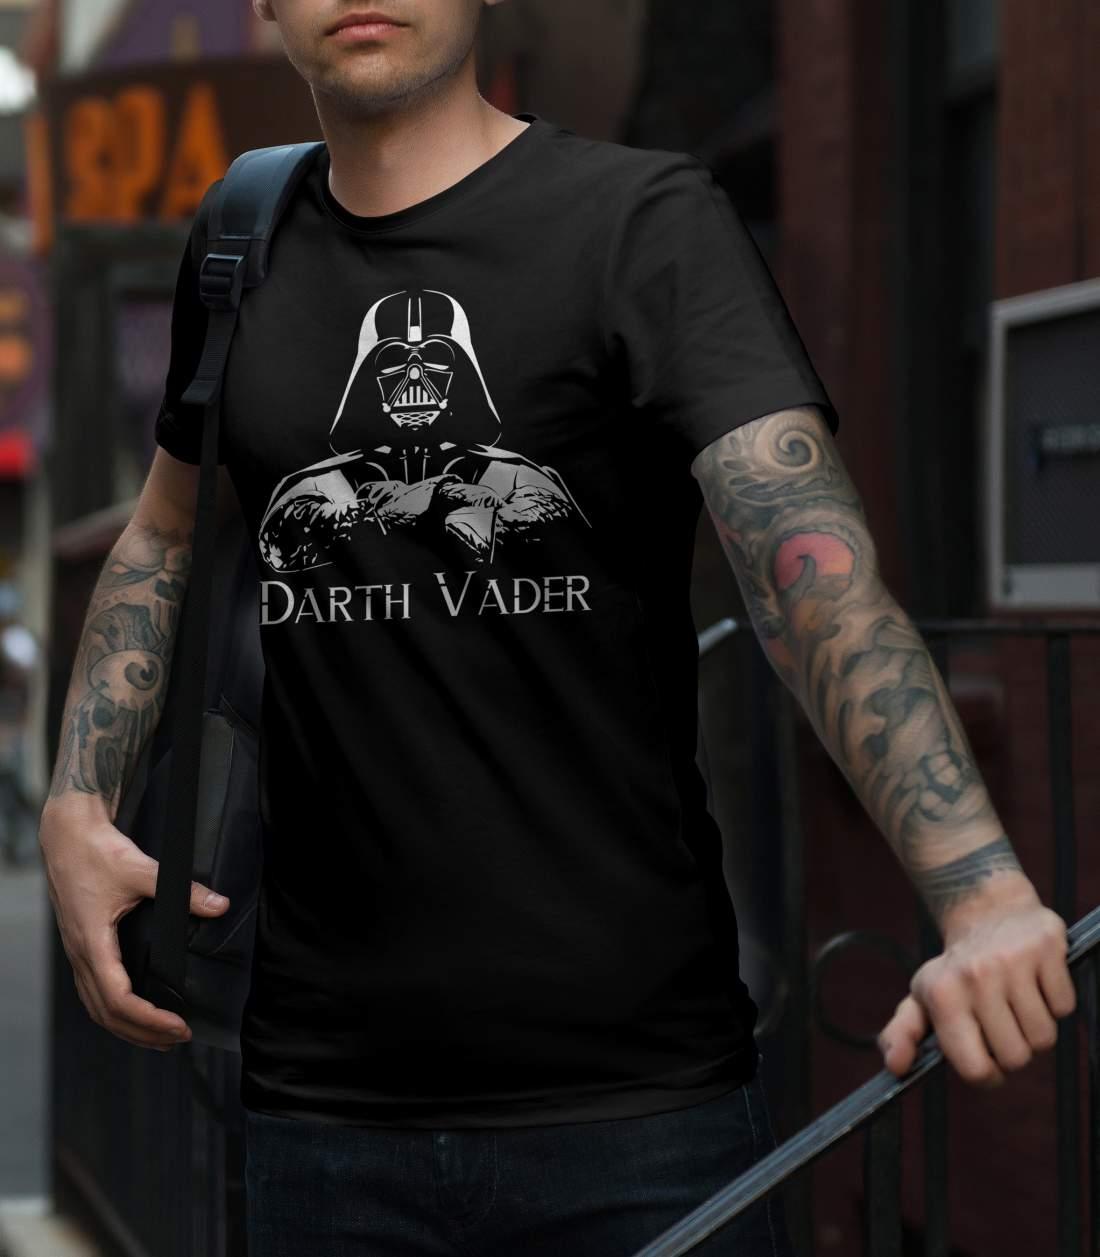 Darth Vader 2 férfi póló fekete